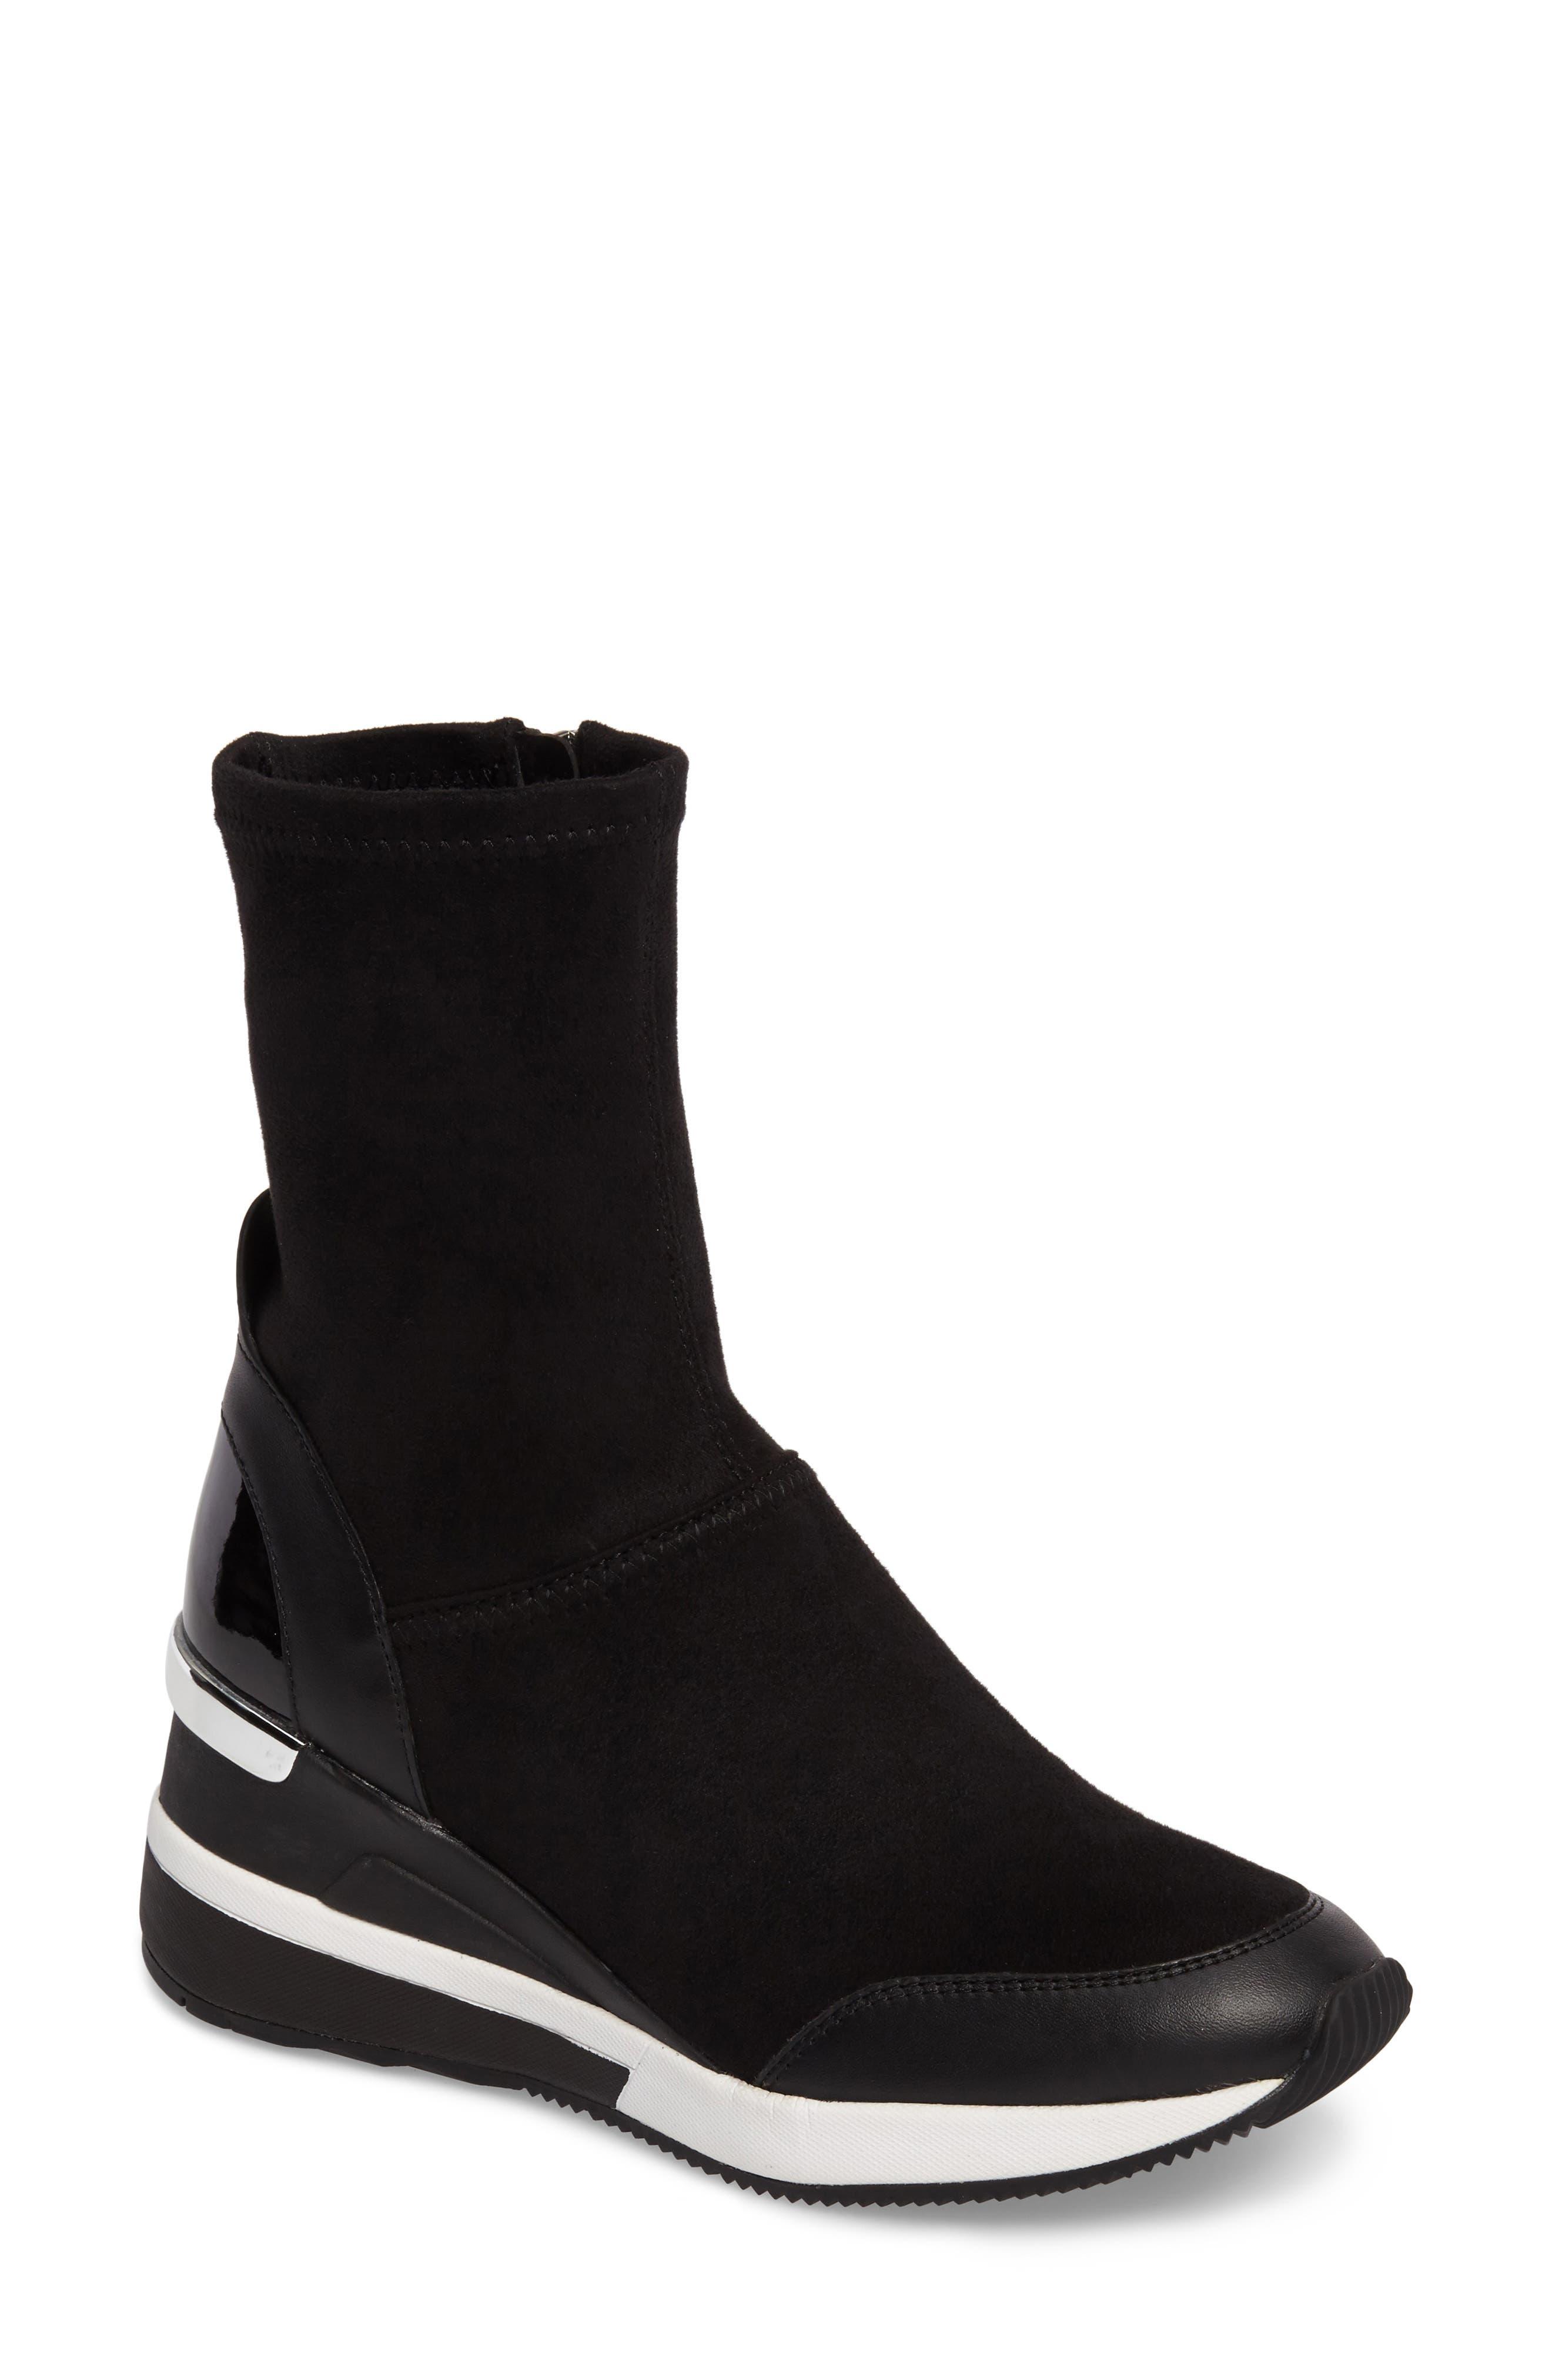 Main Image - MICHAEL Michael Kors 'Ace' Wedge Sneaker Bootie (Women)